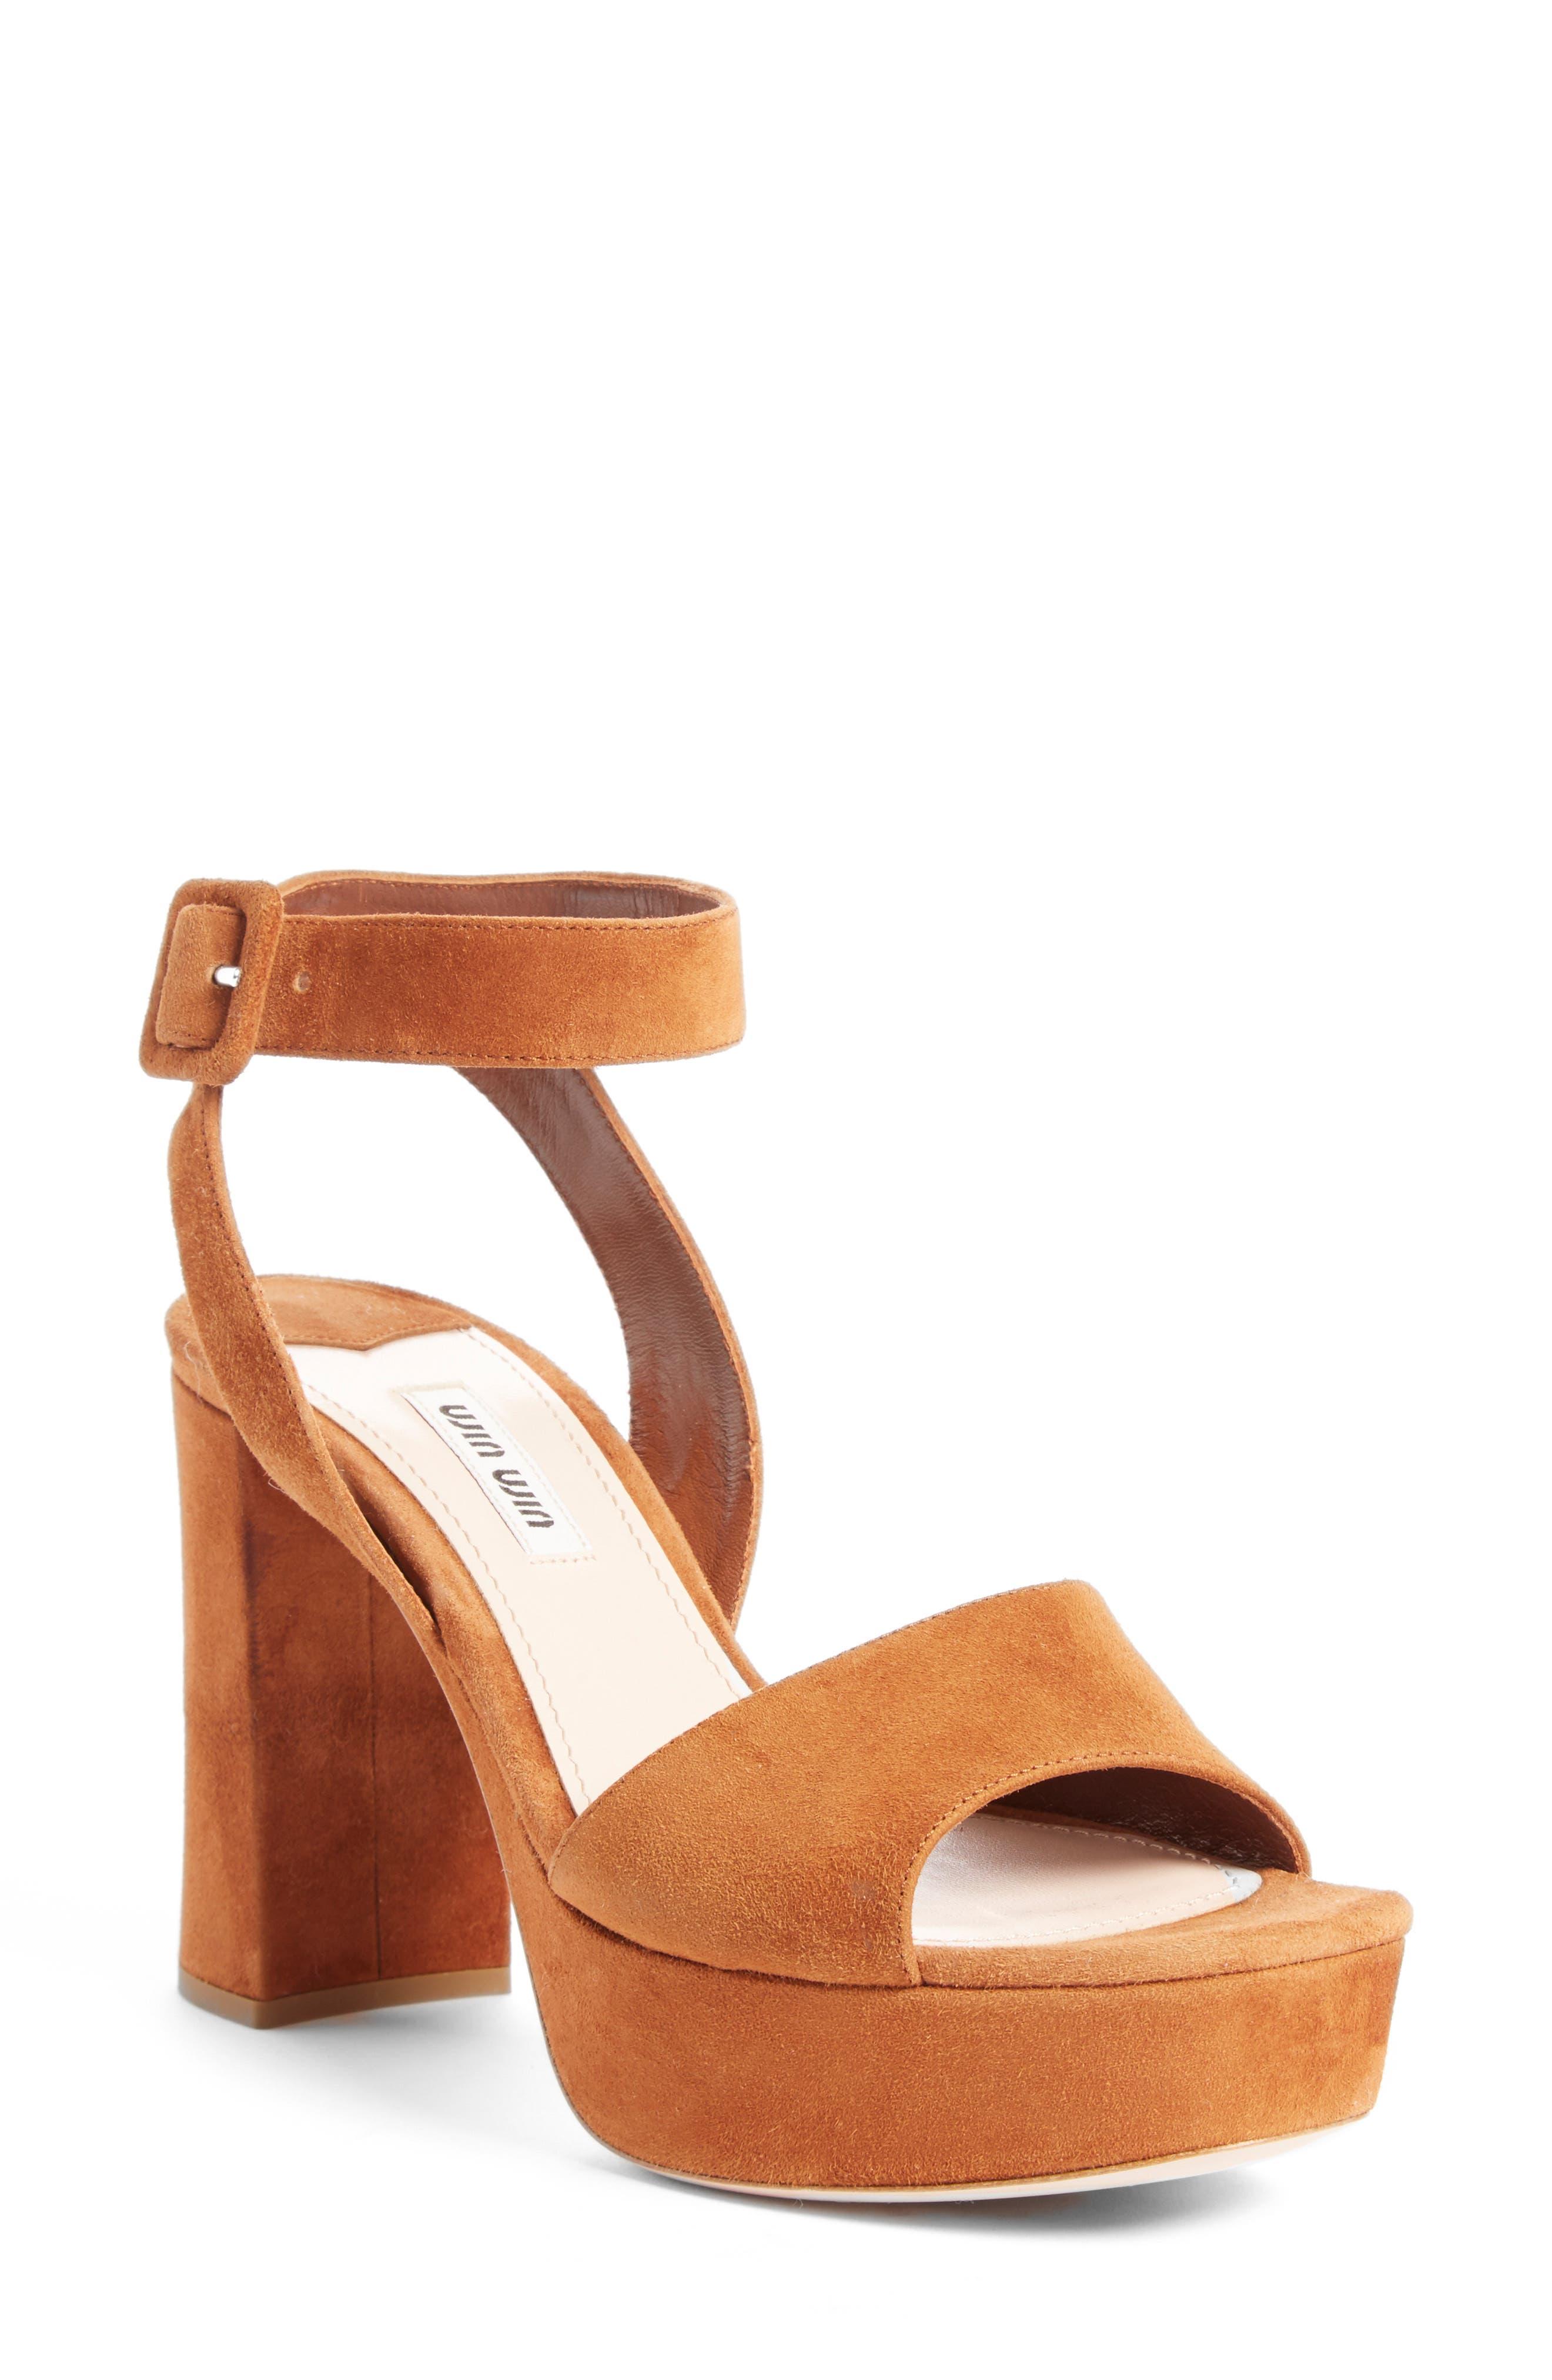 MIU MIU, 'Sandali' Ankle Strap Sandal, Alternate thumbnail 3, color, 200